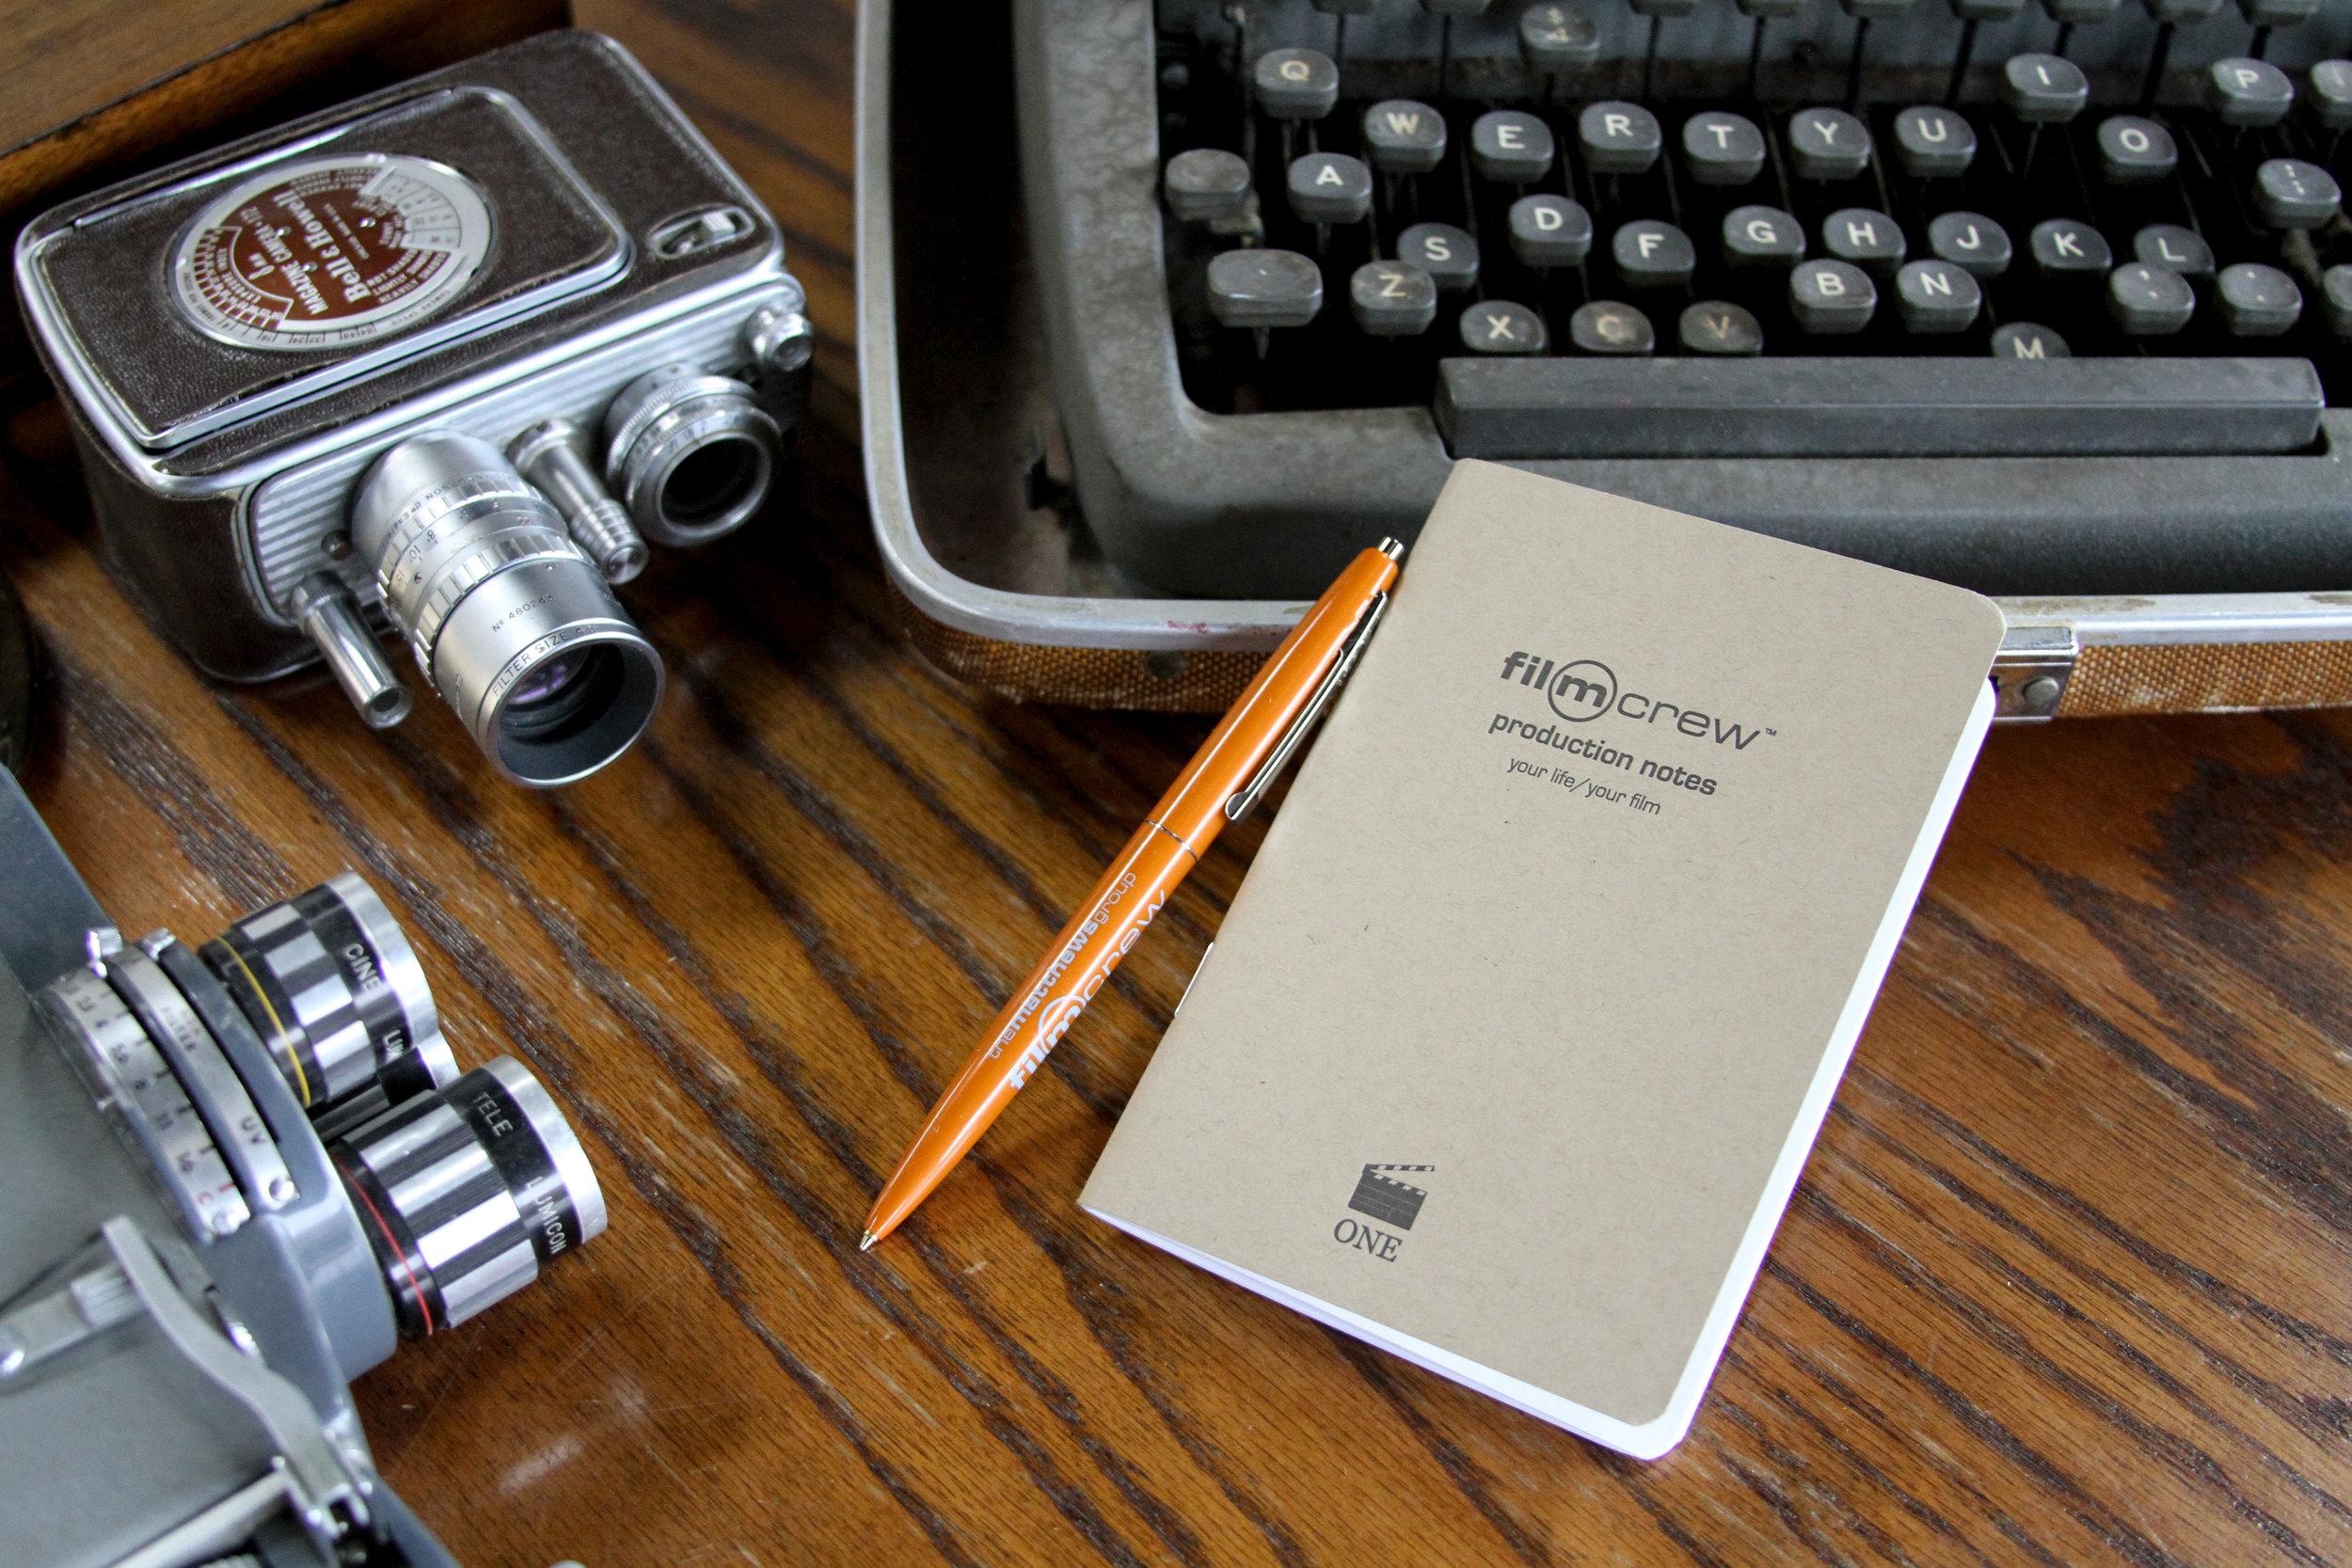 NotebookBundle-0512.jpg